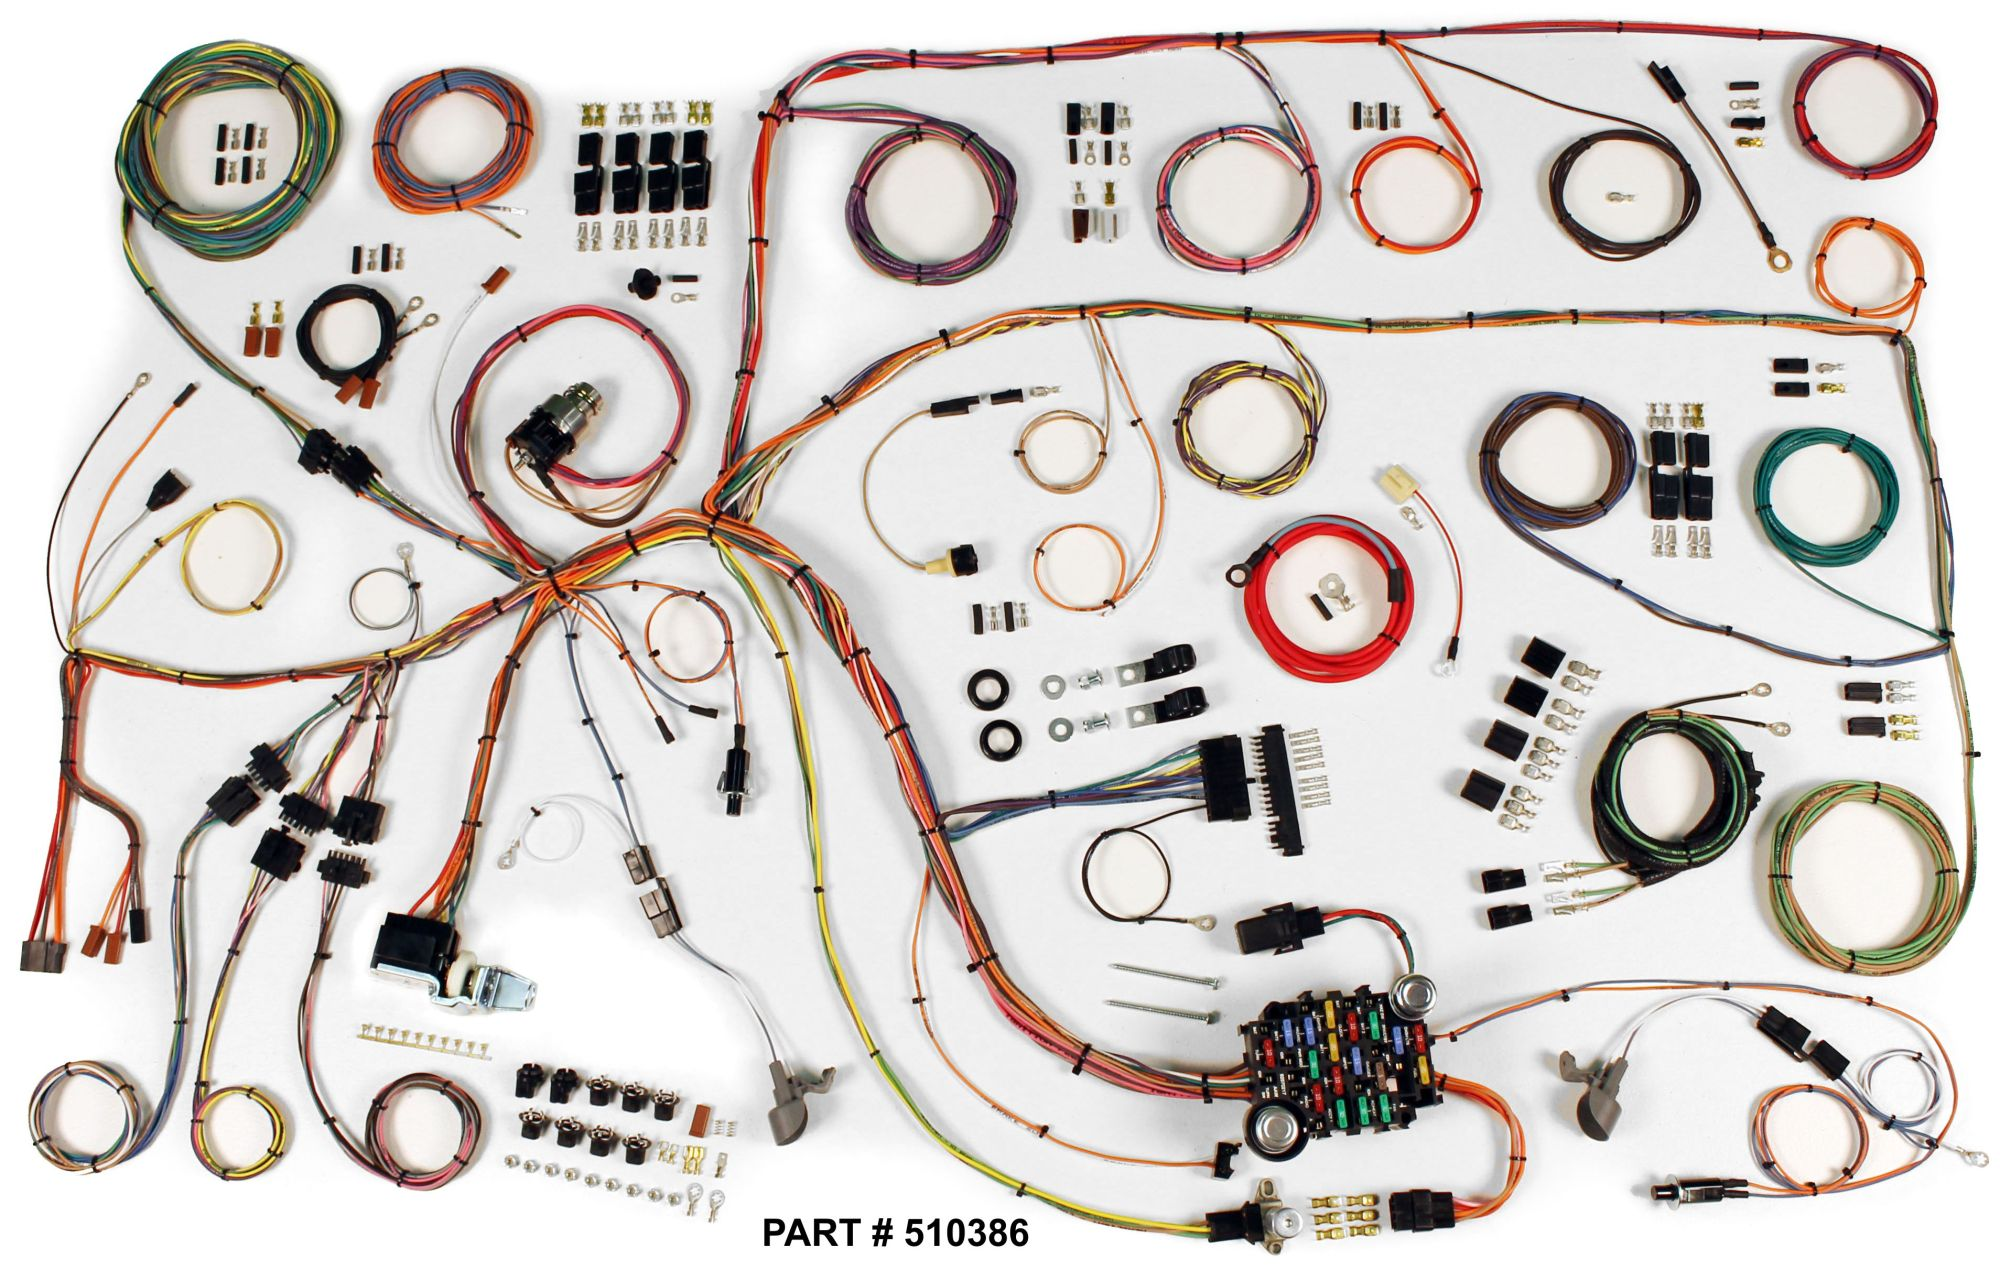 hight resolution of 1965 falcon restomod wiring harness system